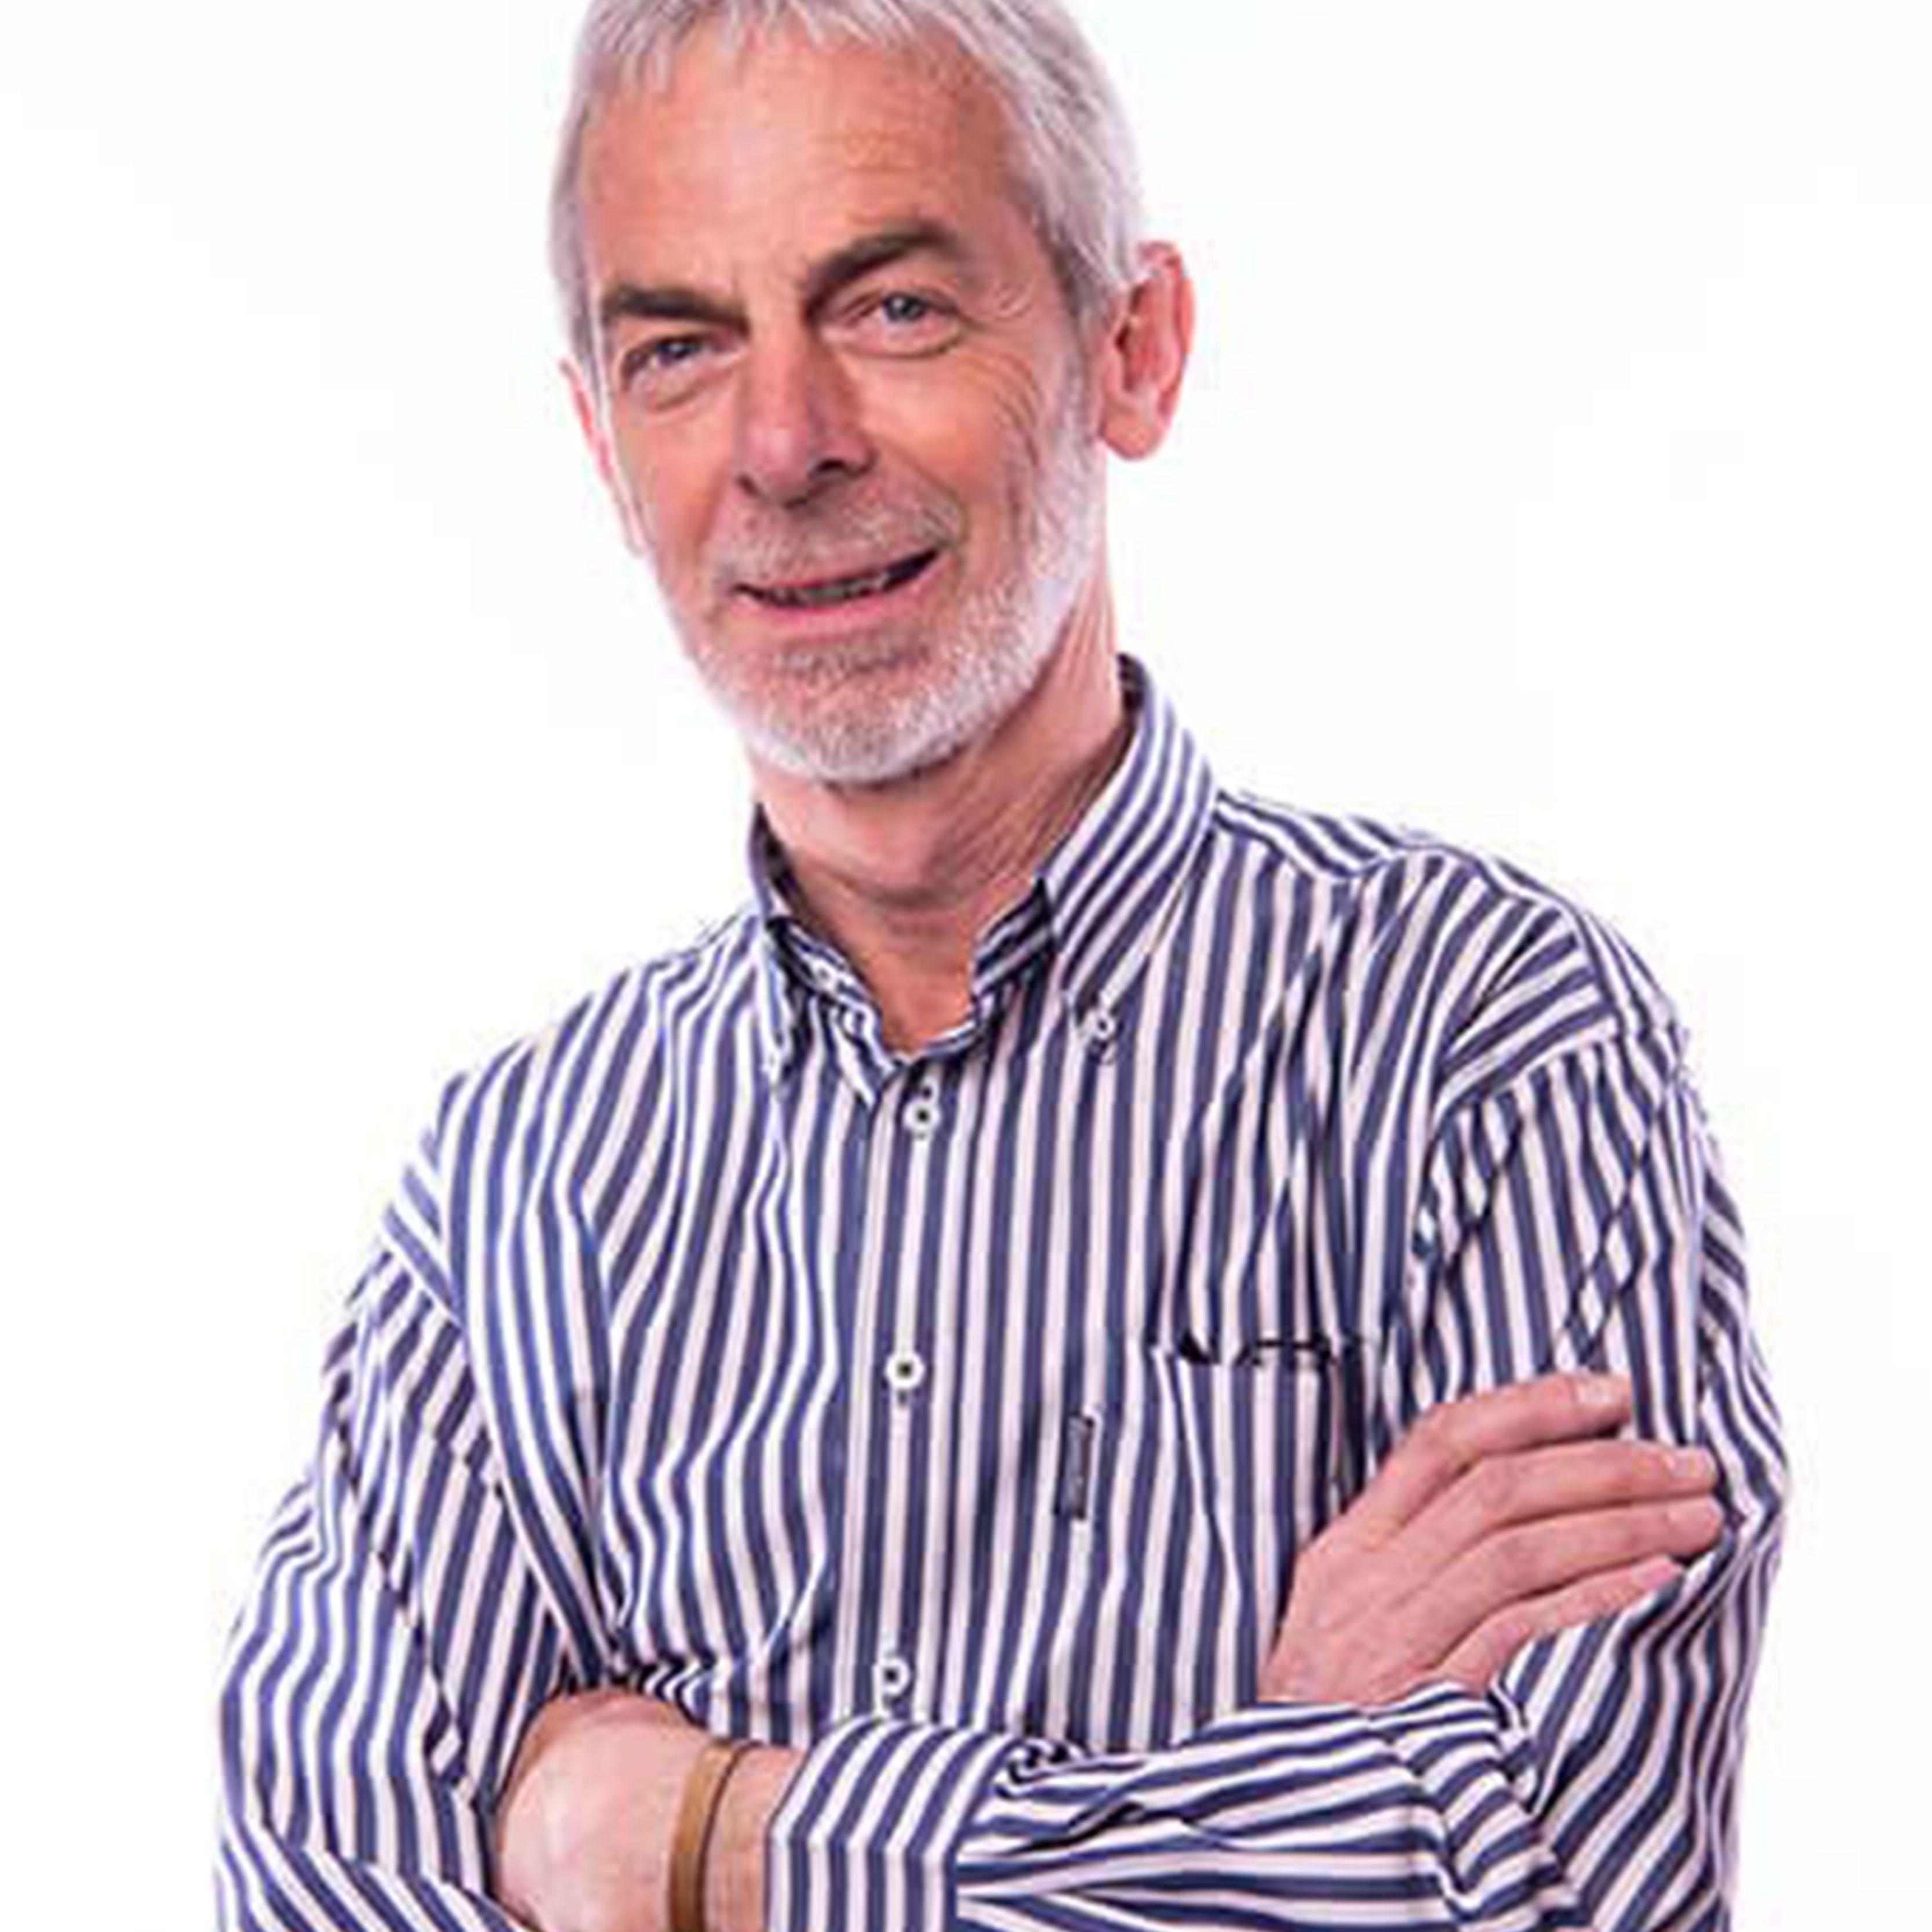 Profile photo of Gerrit Visser, Processing Executive at Astral Foods